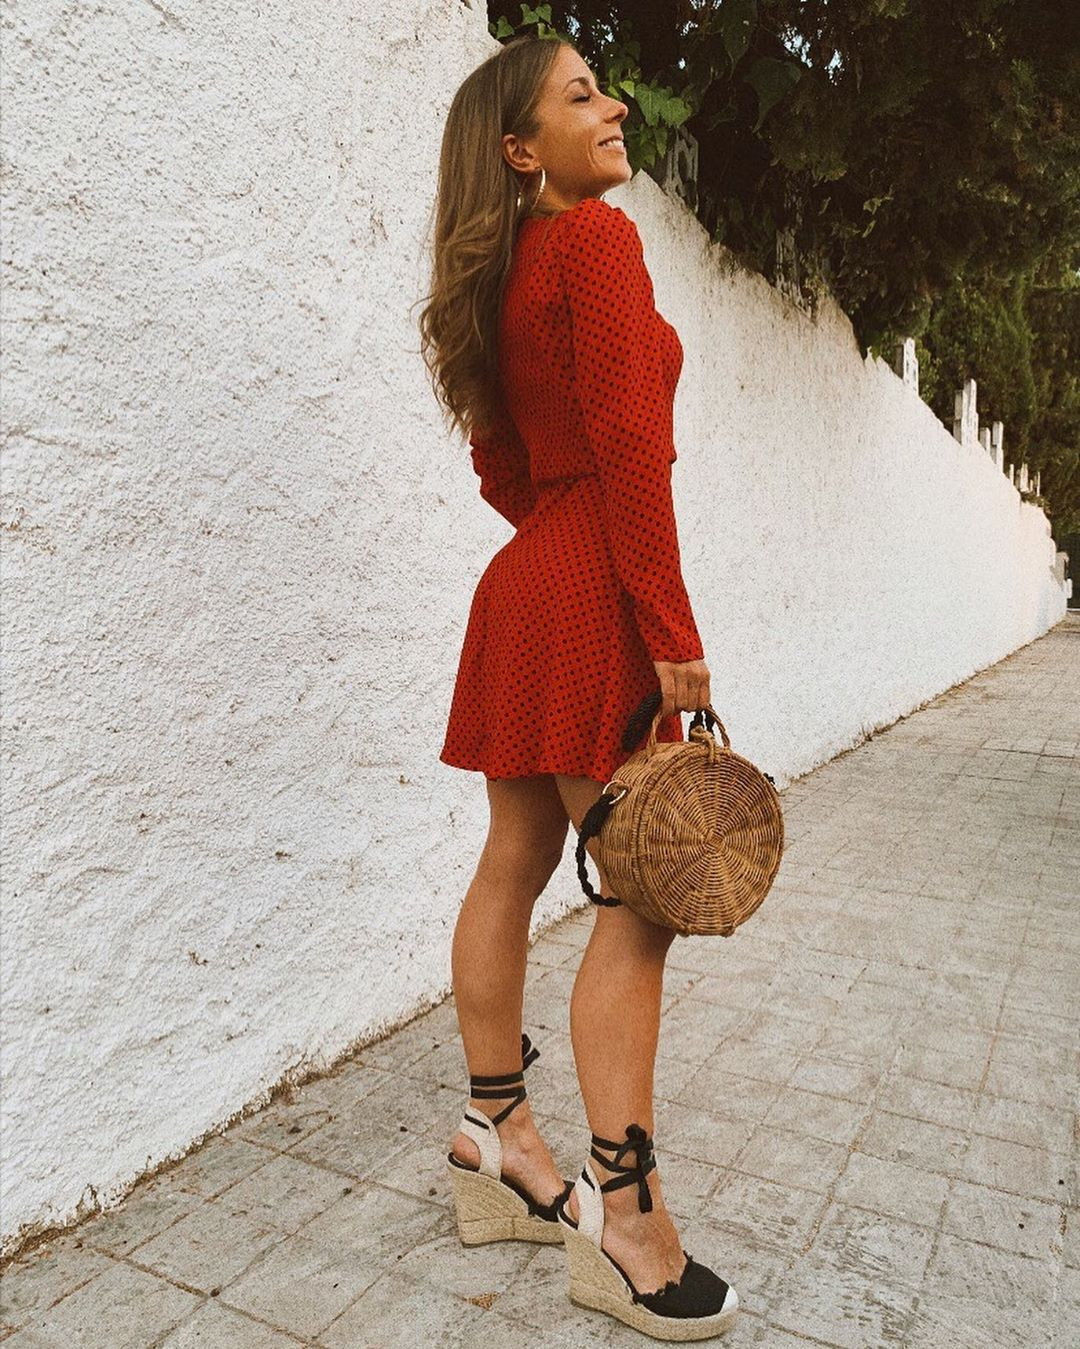 polka dot dress de Zara sur rozuhcas